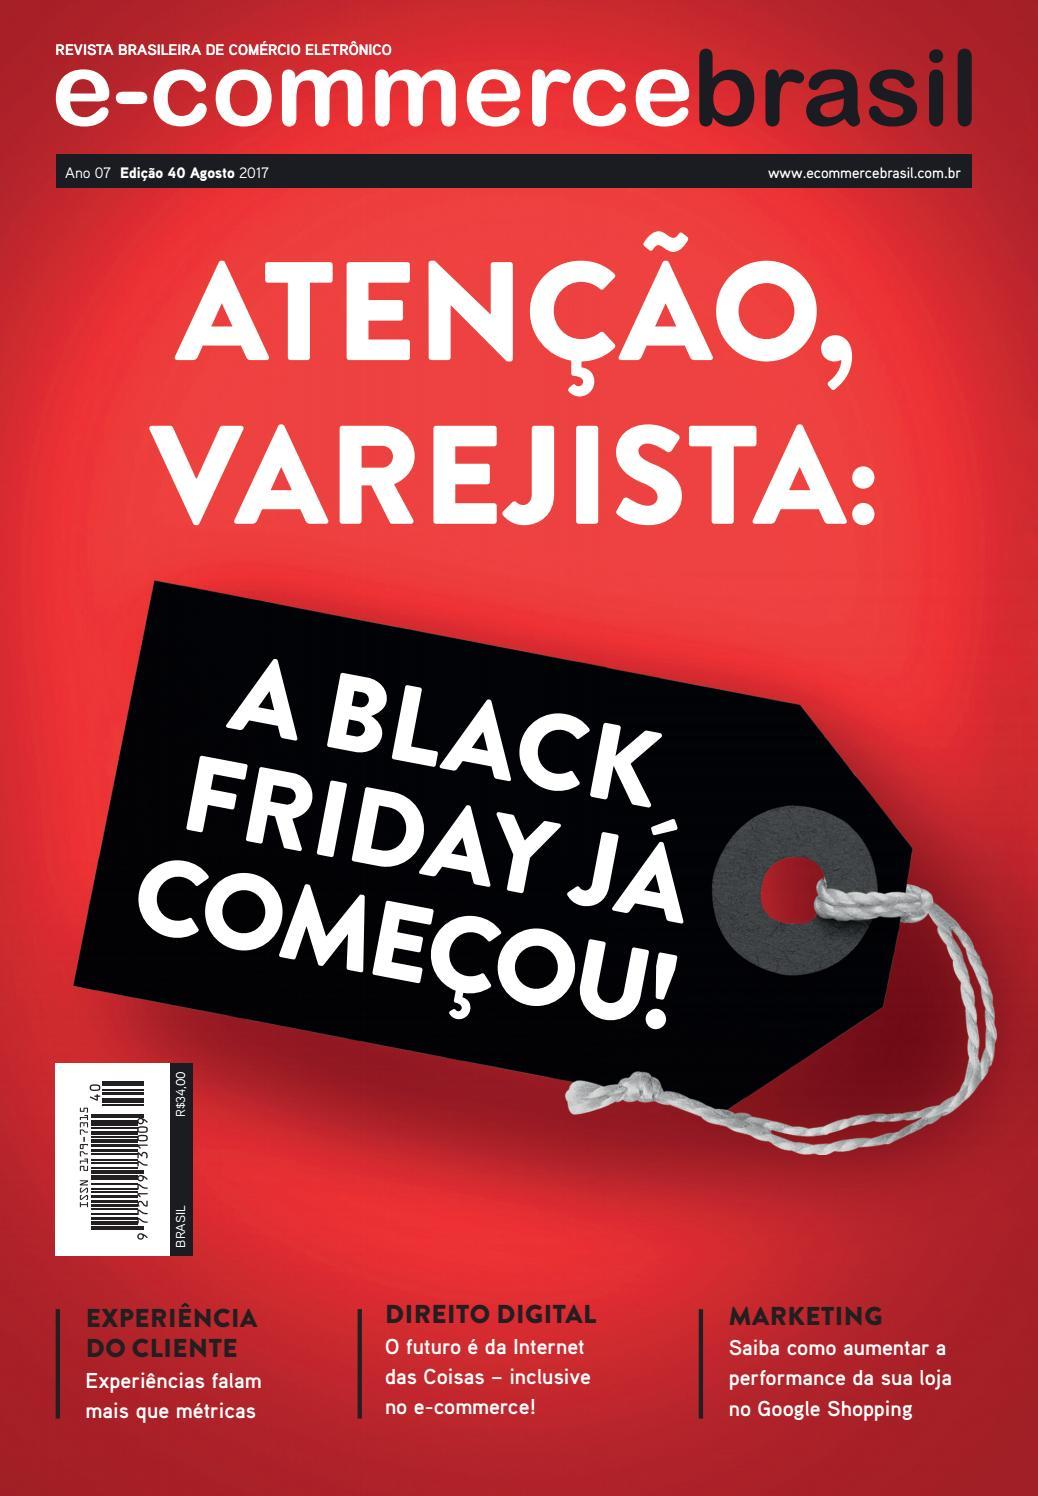 Atenção Varejista  a Black Friday já começou! by E-Commerce Brasil - issuu 99f621e2f4